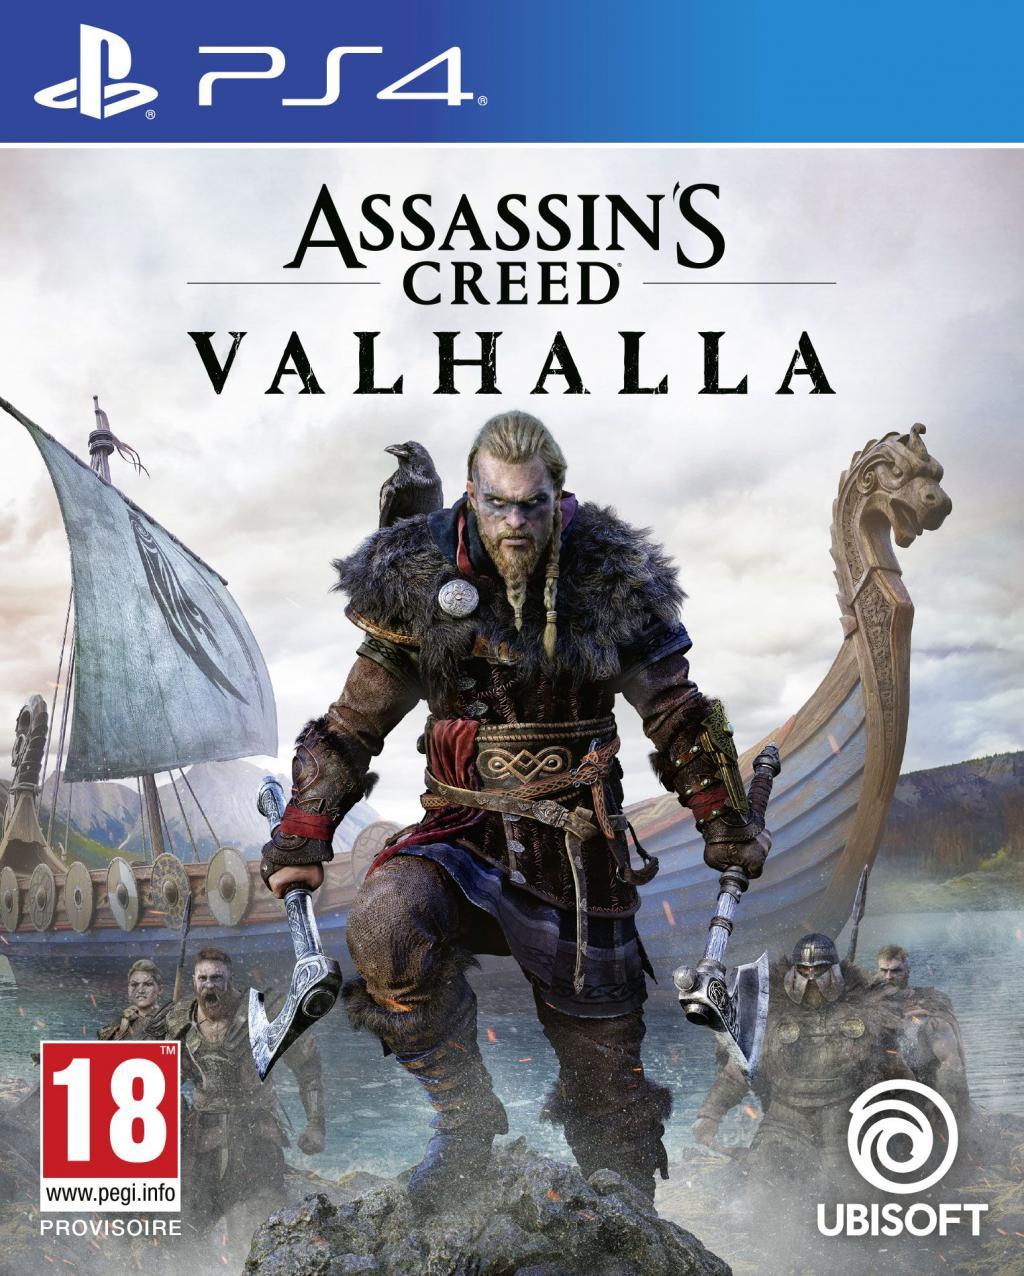 Assassin's Creed Valhalla - UPGRADE PS5 free_1